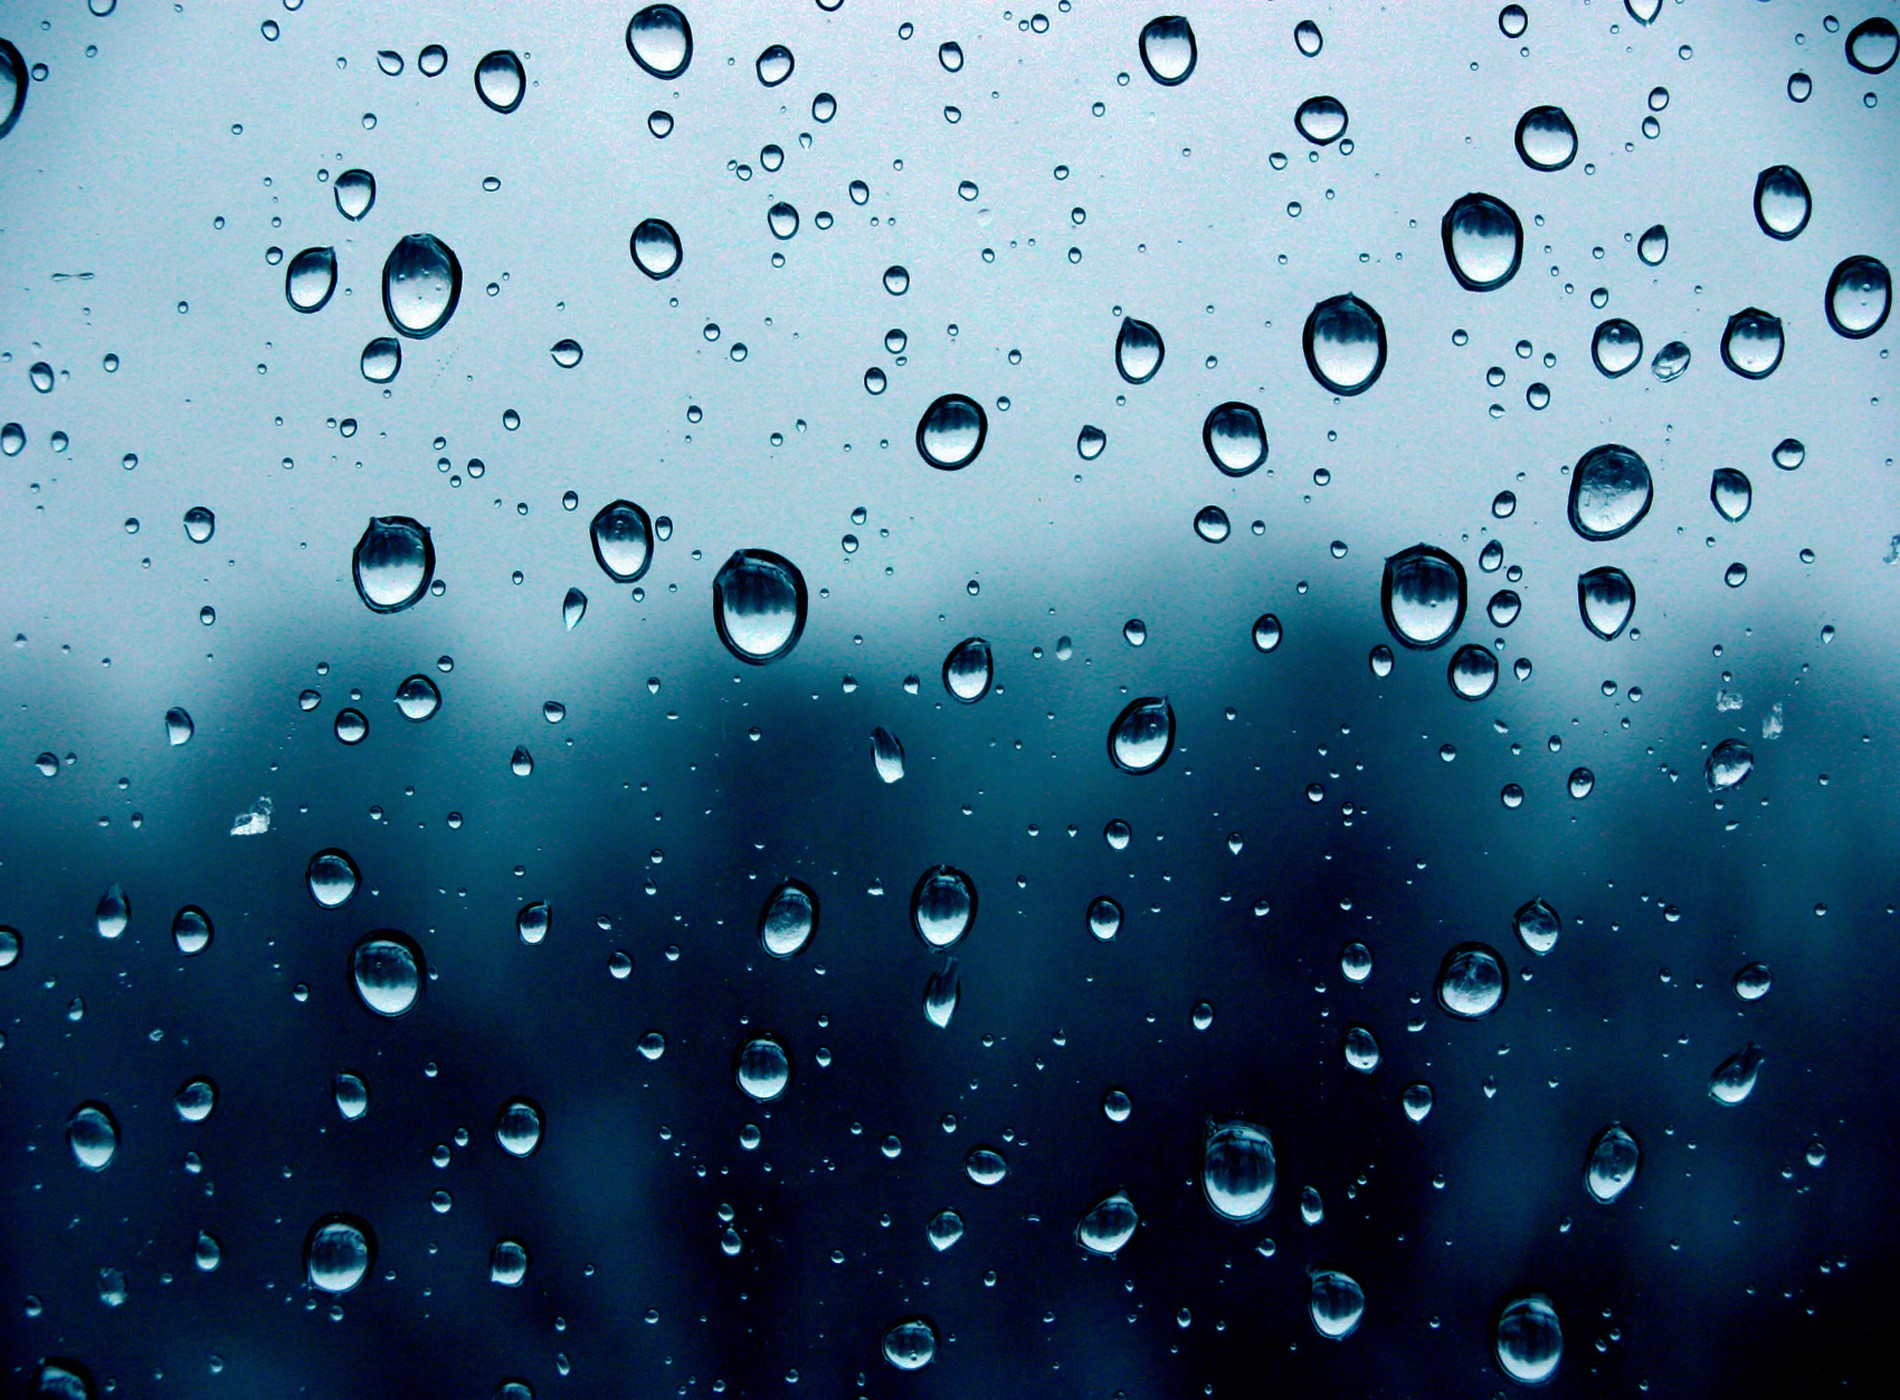 Raindrops - Typotic